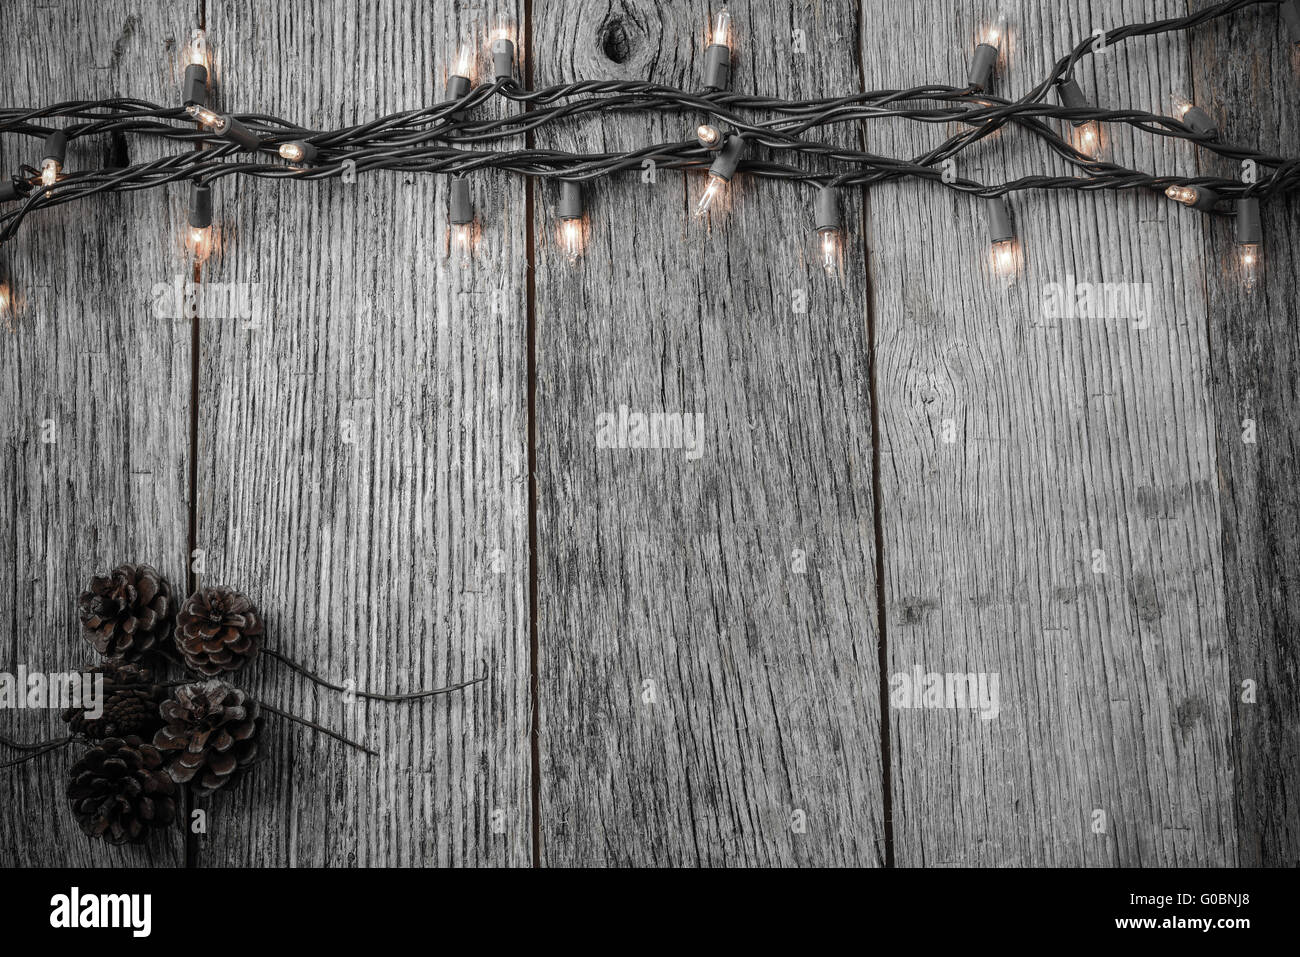 Weihnachtsbeleuchtung Kegel.Weihnachtsbeleuchtung Und Kiefer Kegel Auf Rustikalen Holz